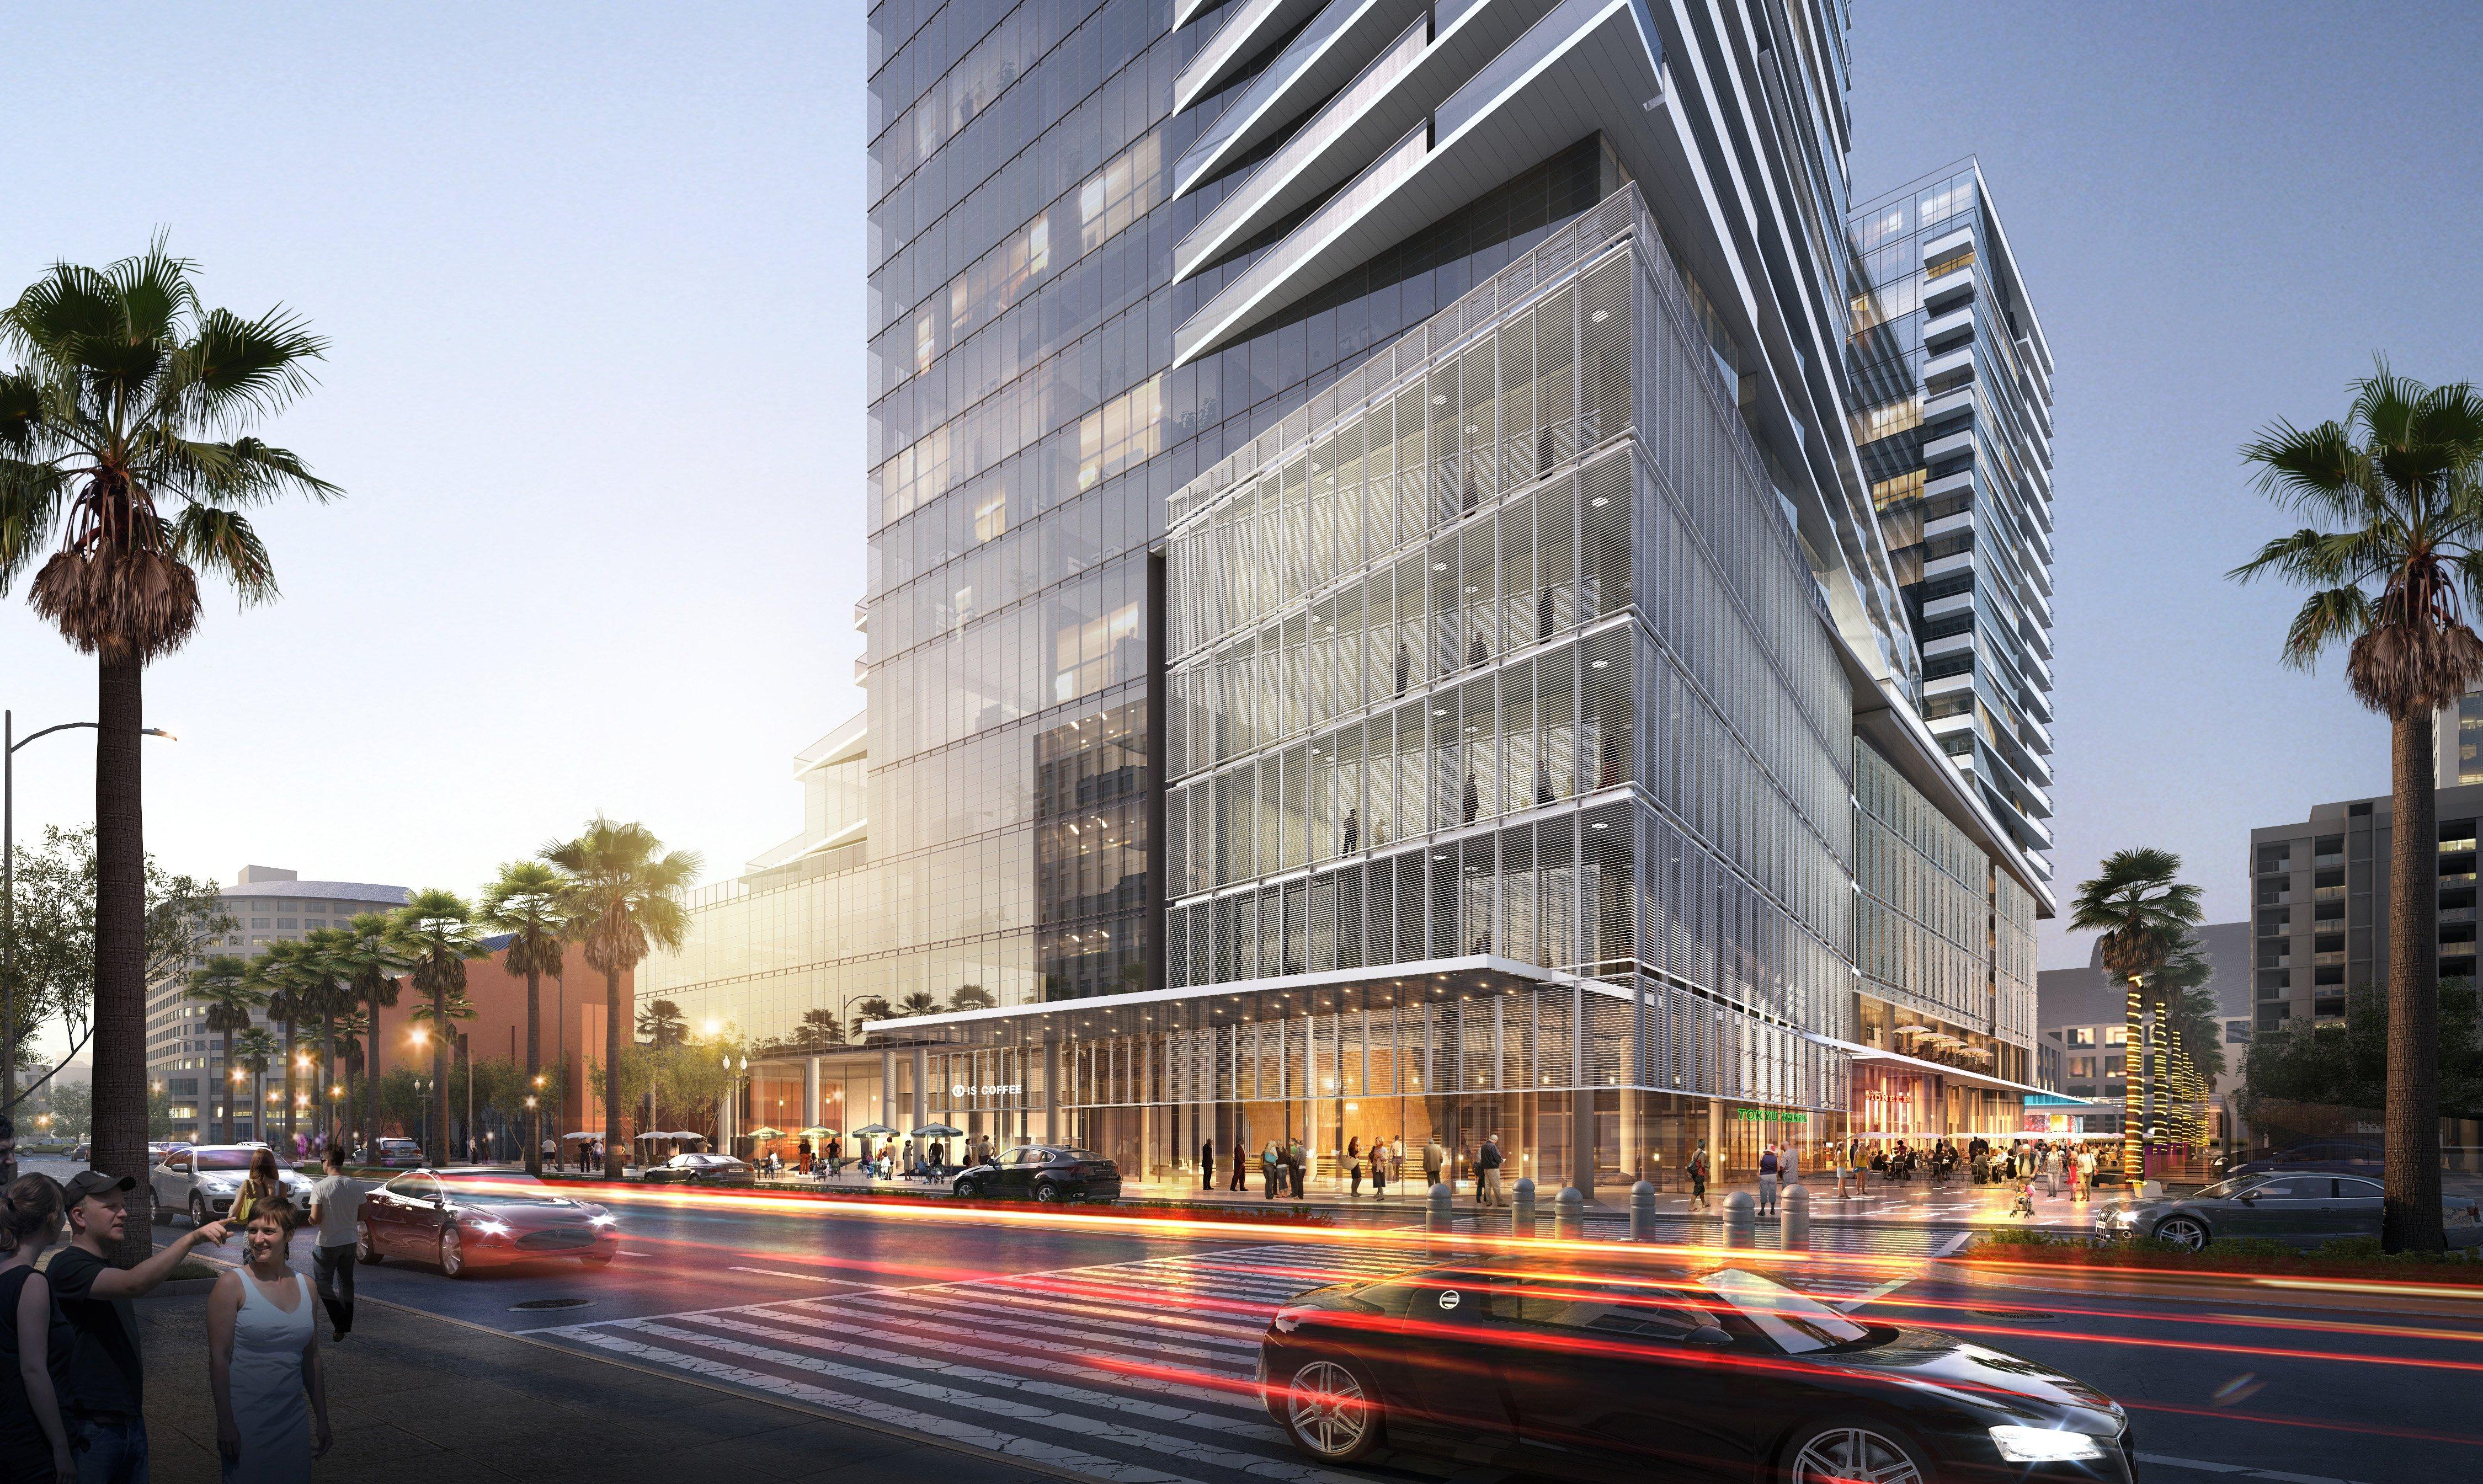 Kimpton Hotels  Restaurants Announce Partnership in Major Silicon